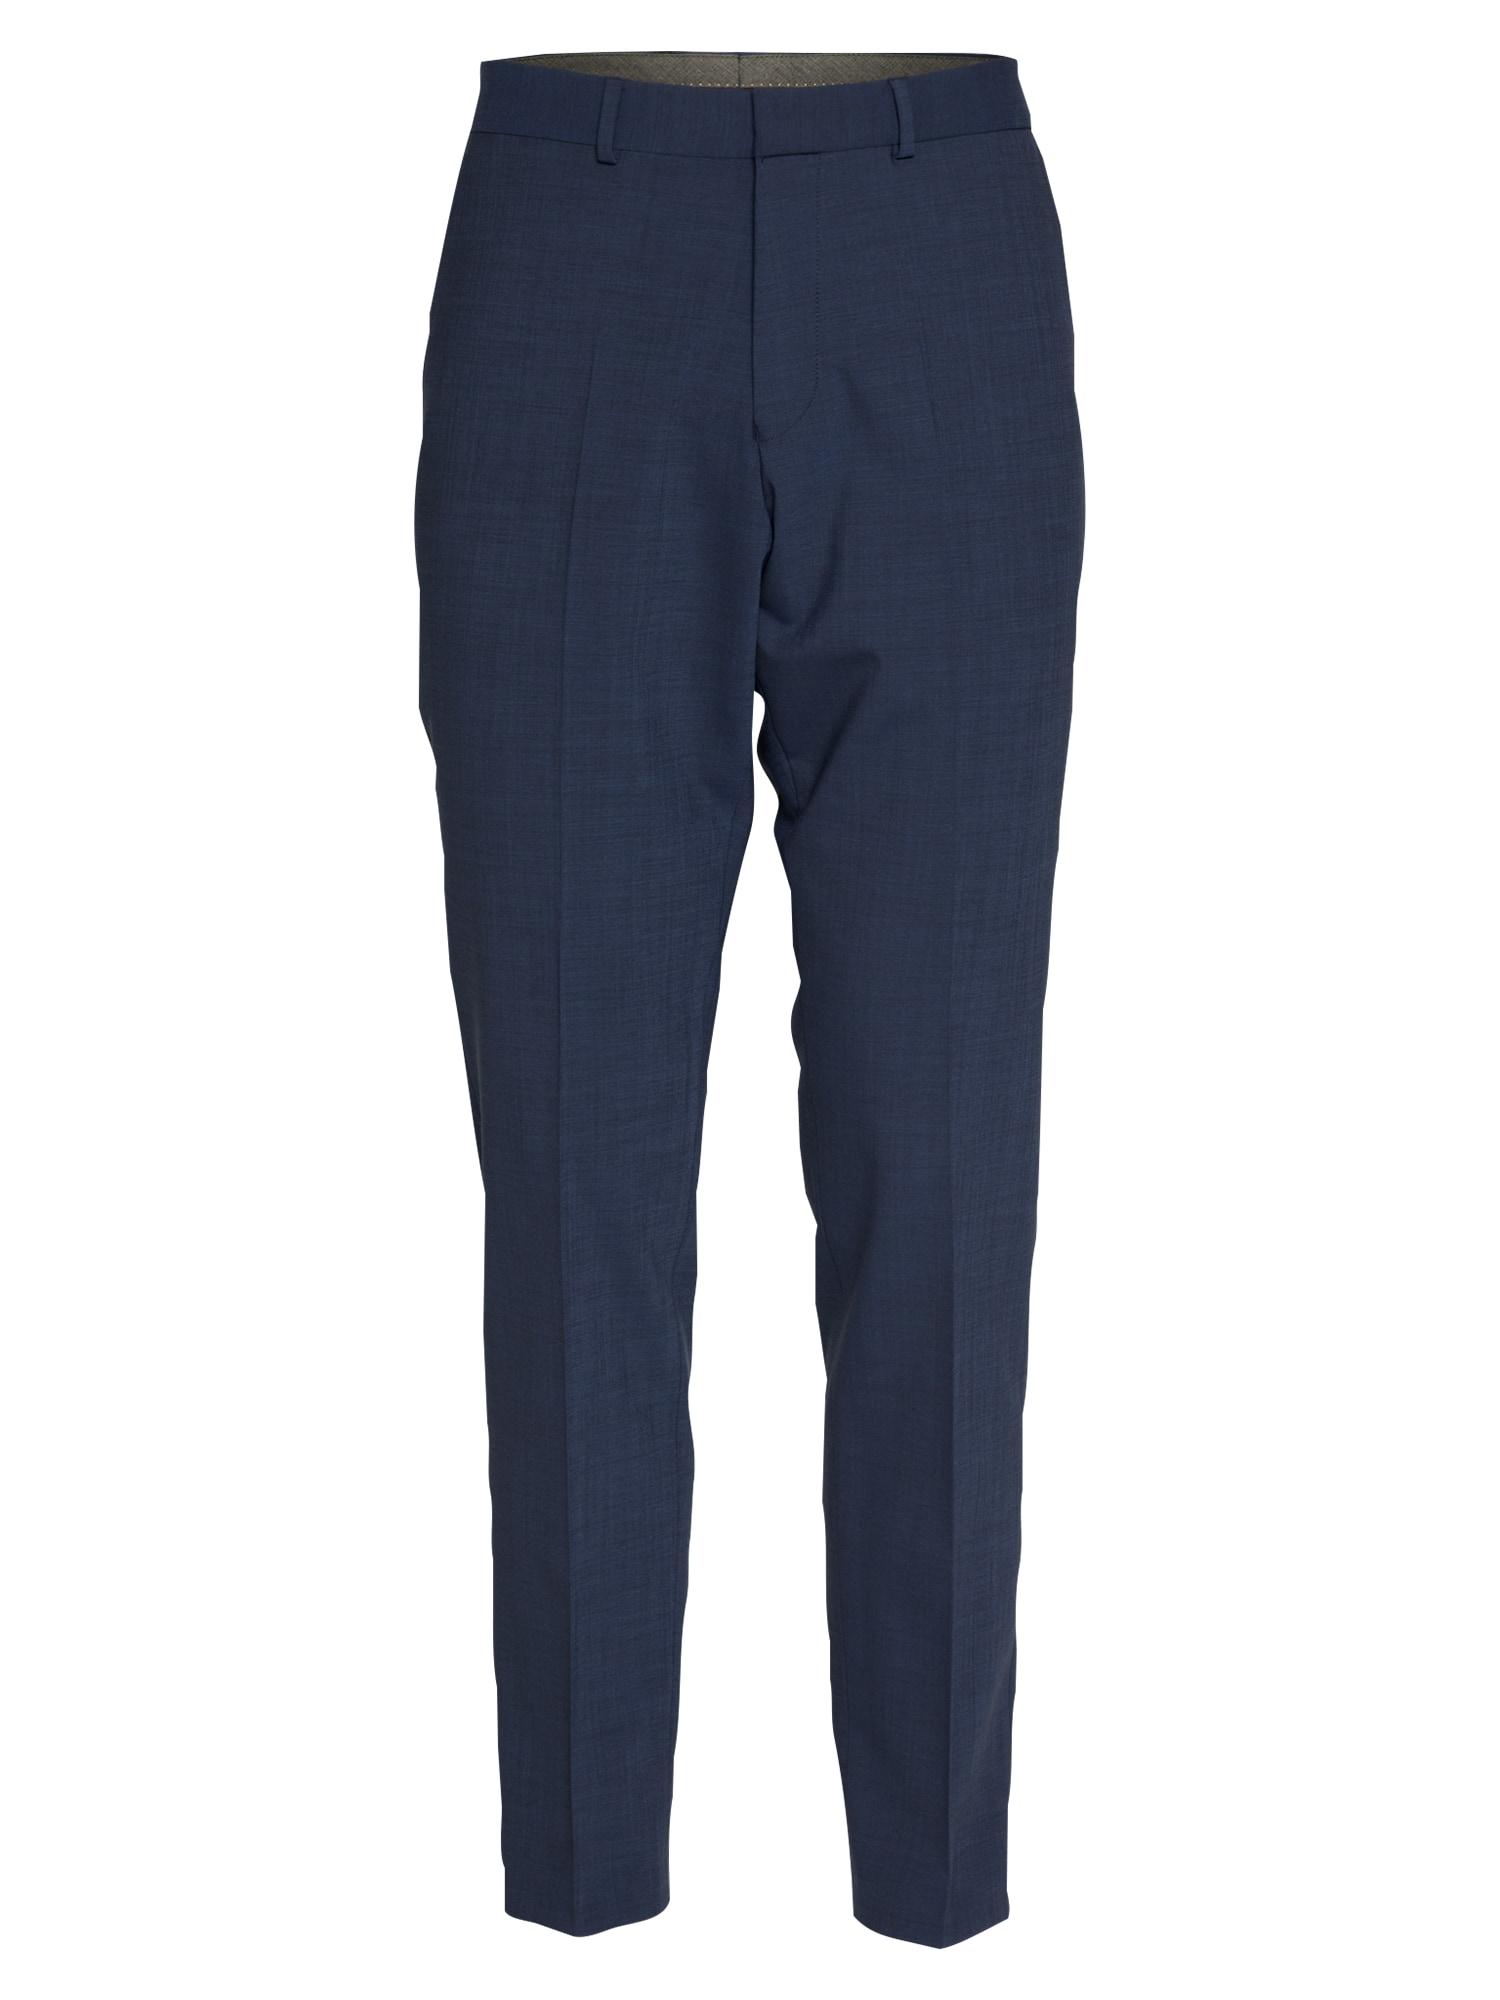 s.Oliver BLACK LABEL Kelnės su kantu tamsiai mėlyna